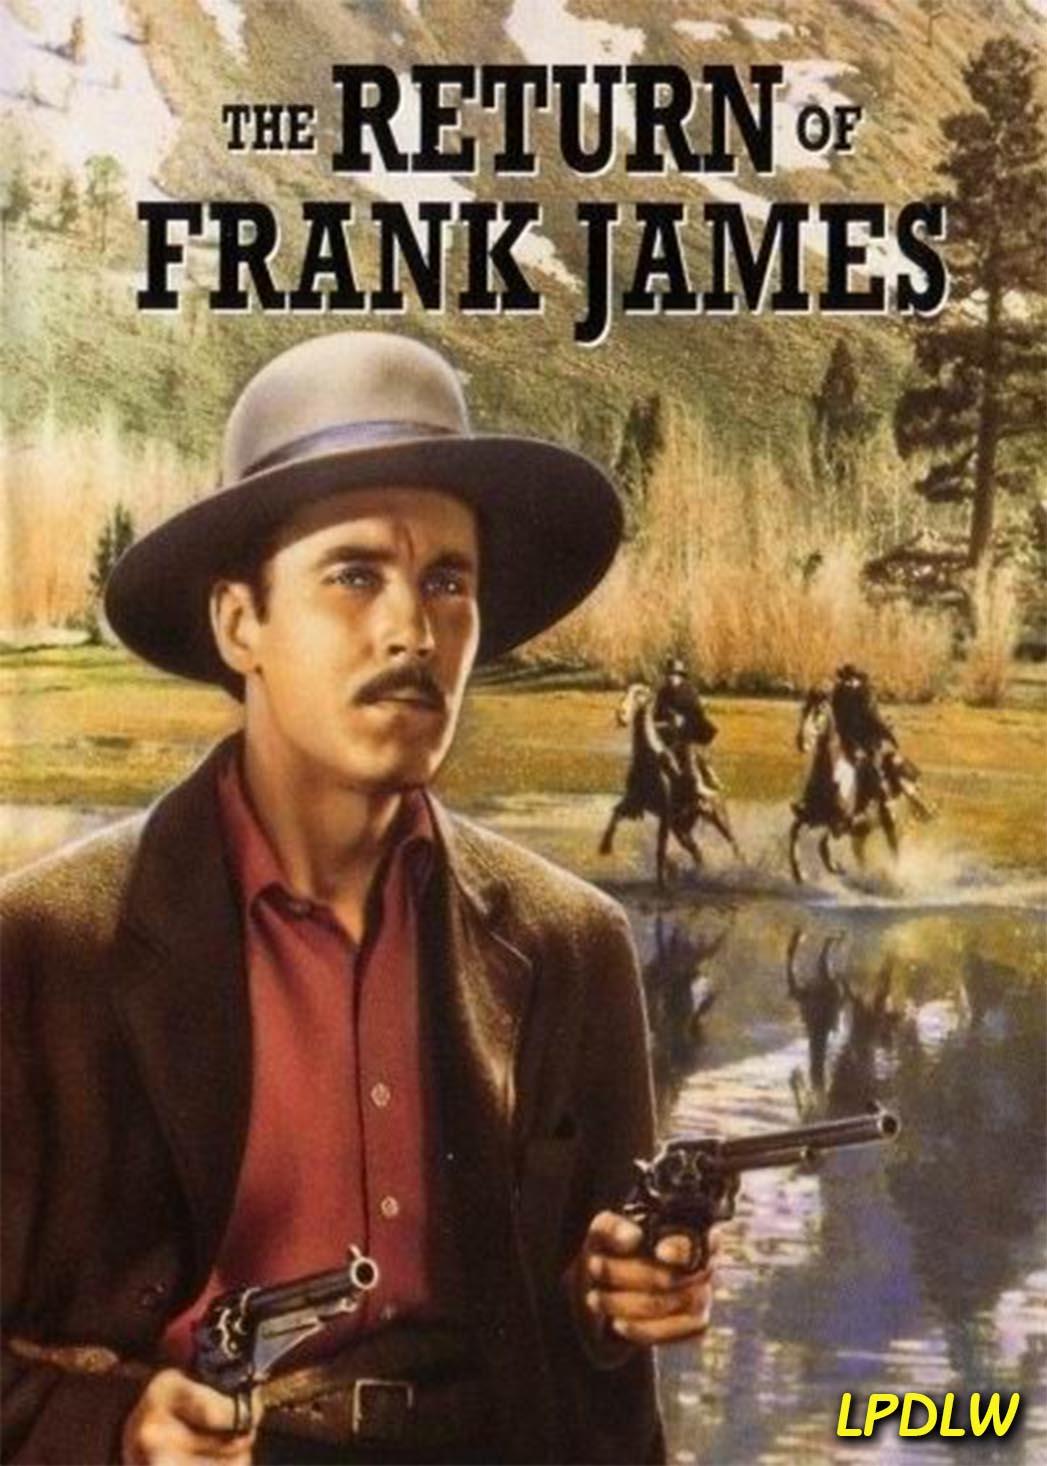 Película de frank james 1989